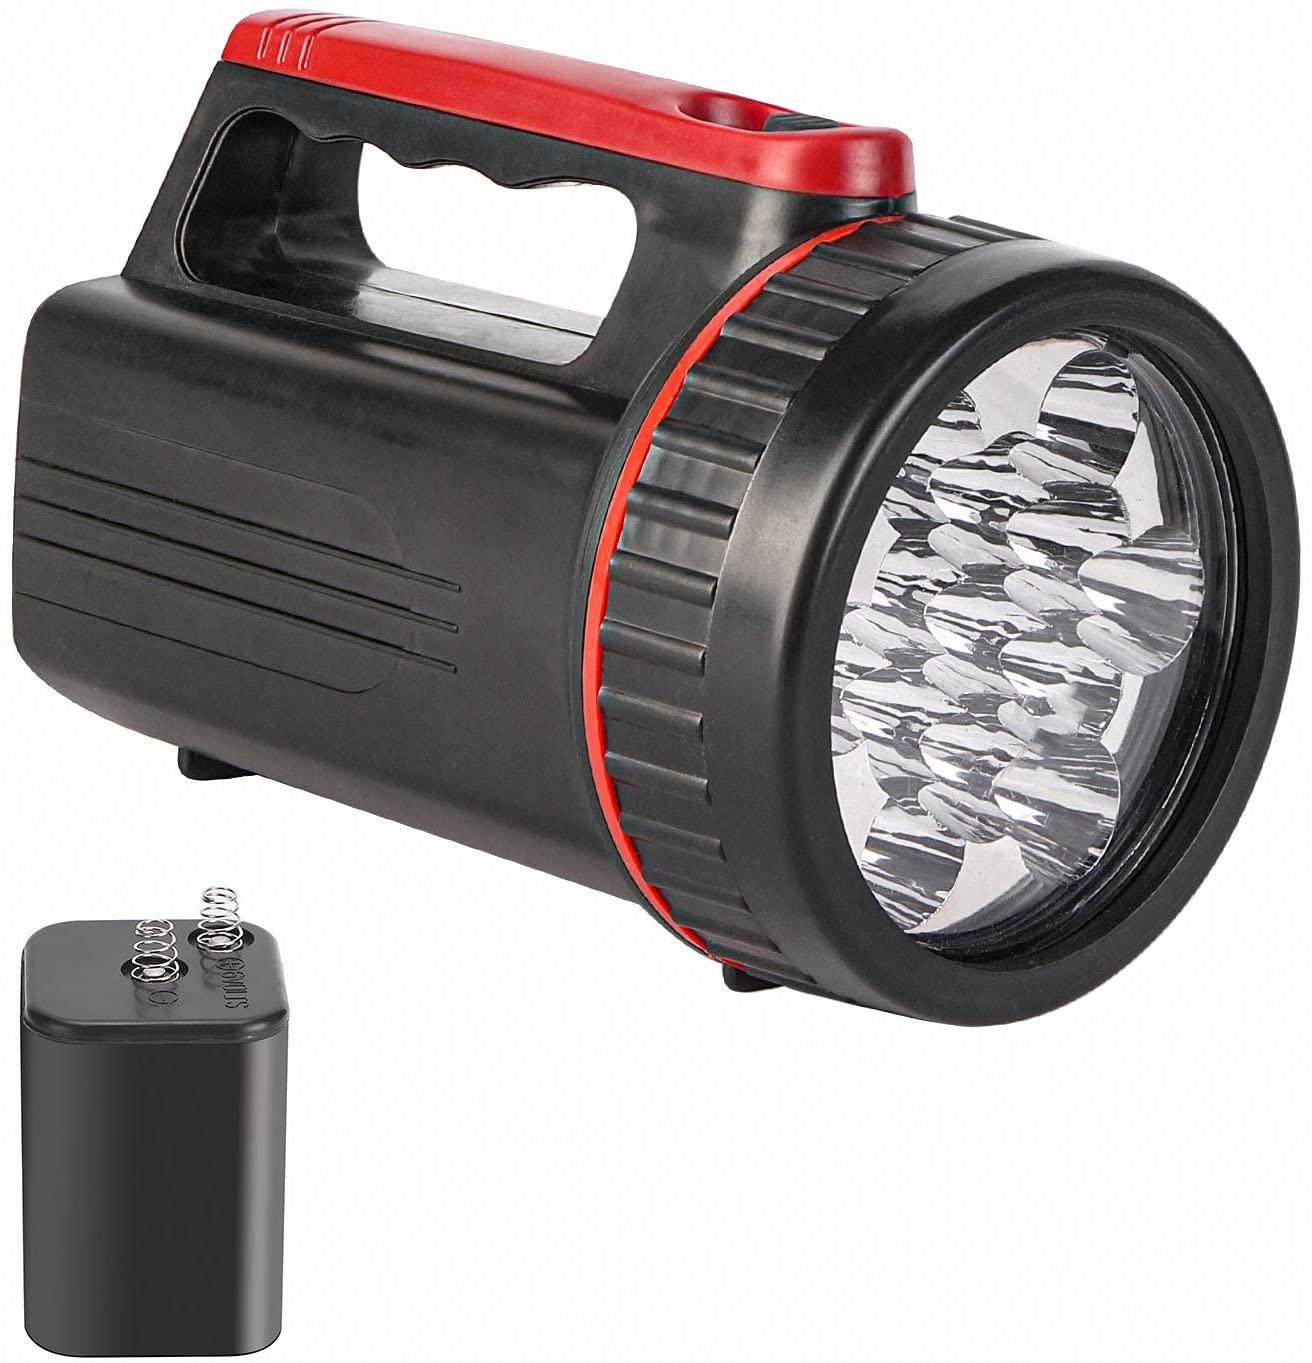 Outdoor Spot Lights Hand-Held Flashlight,280 Lumens Light Bright Long Distance LED Spotlight Searchlight,6 Volt Lantern Battery Powered Lights ,13LED (Black)